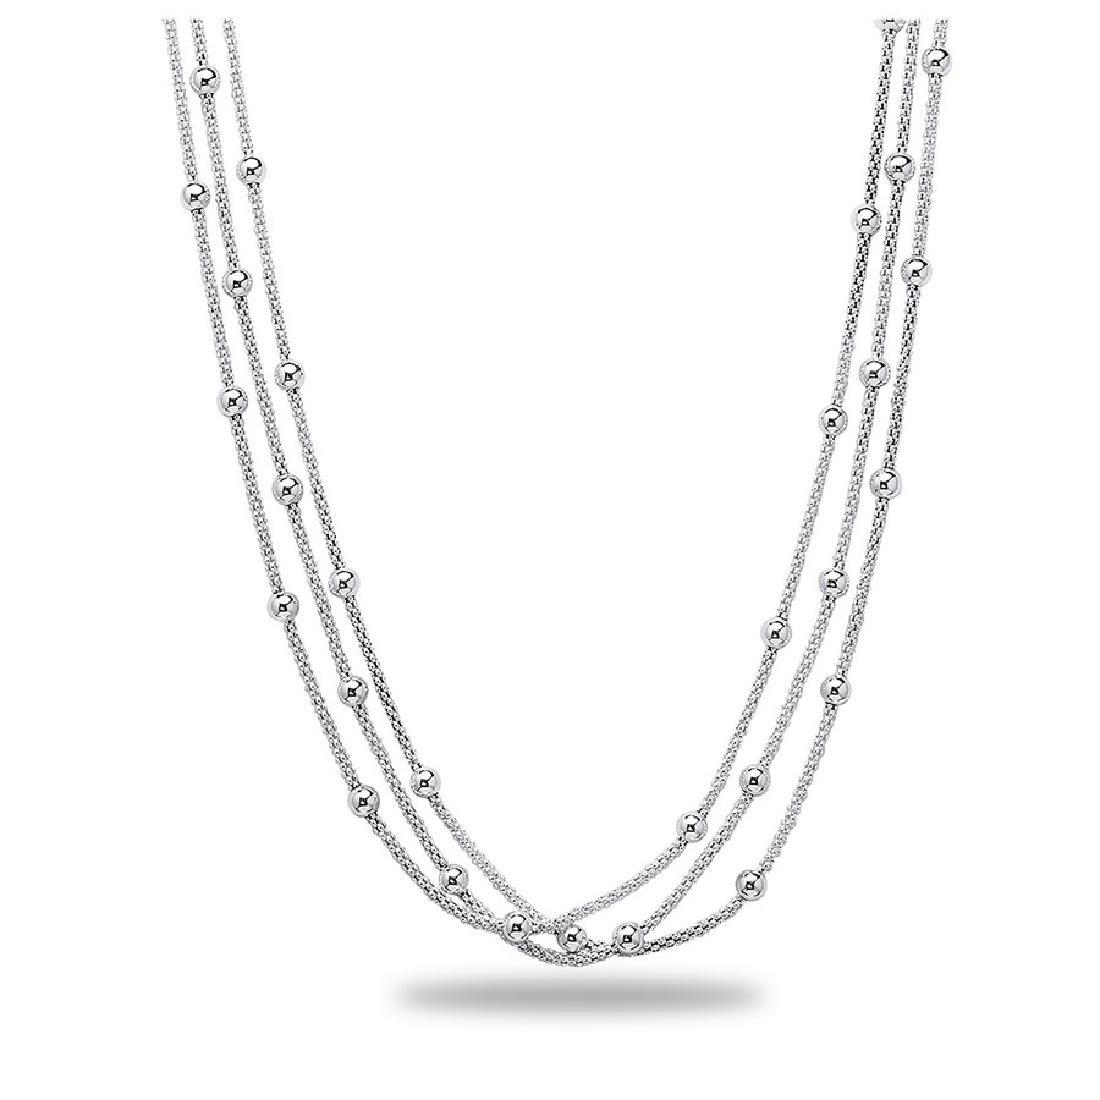 Sterling Silver Polished Necklace